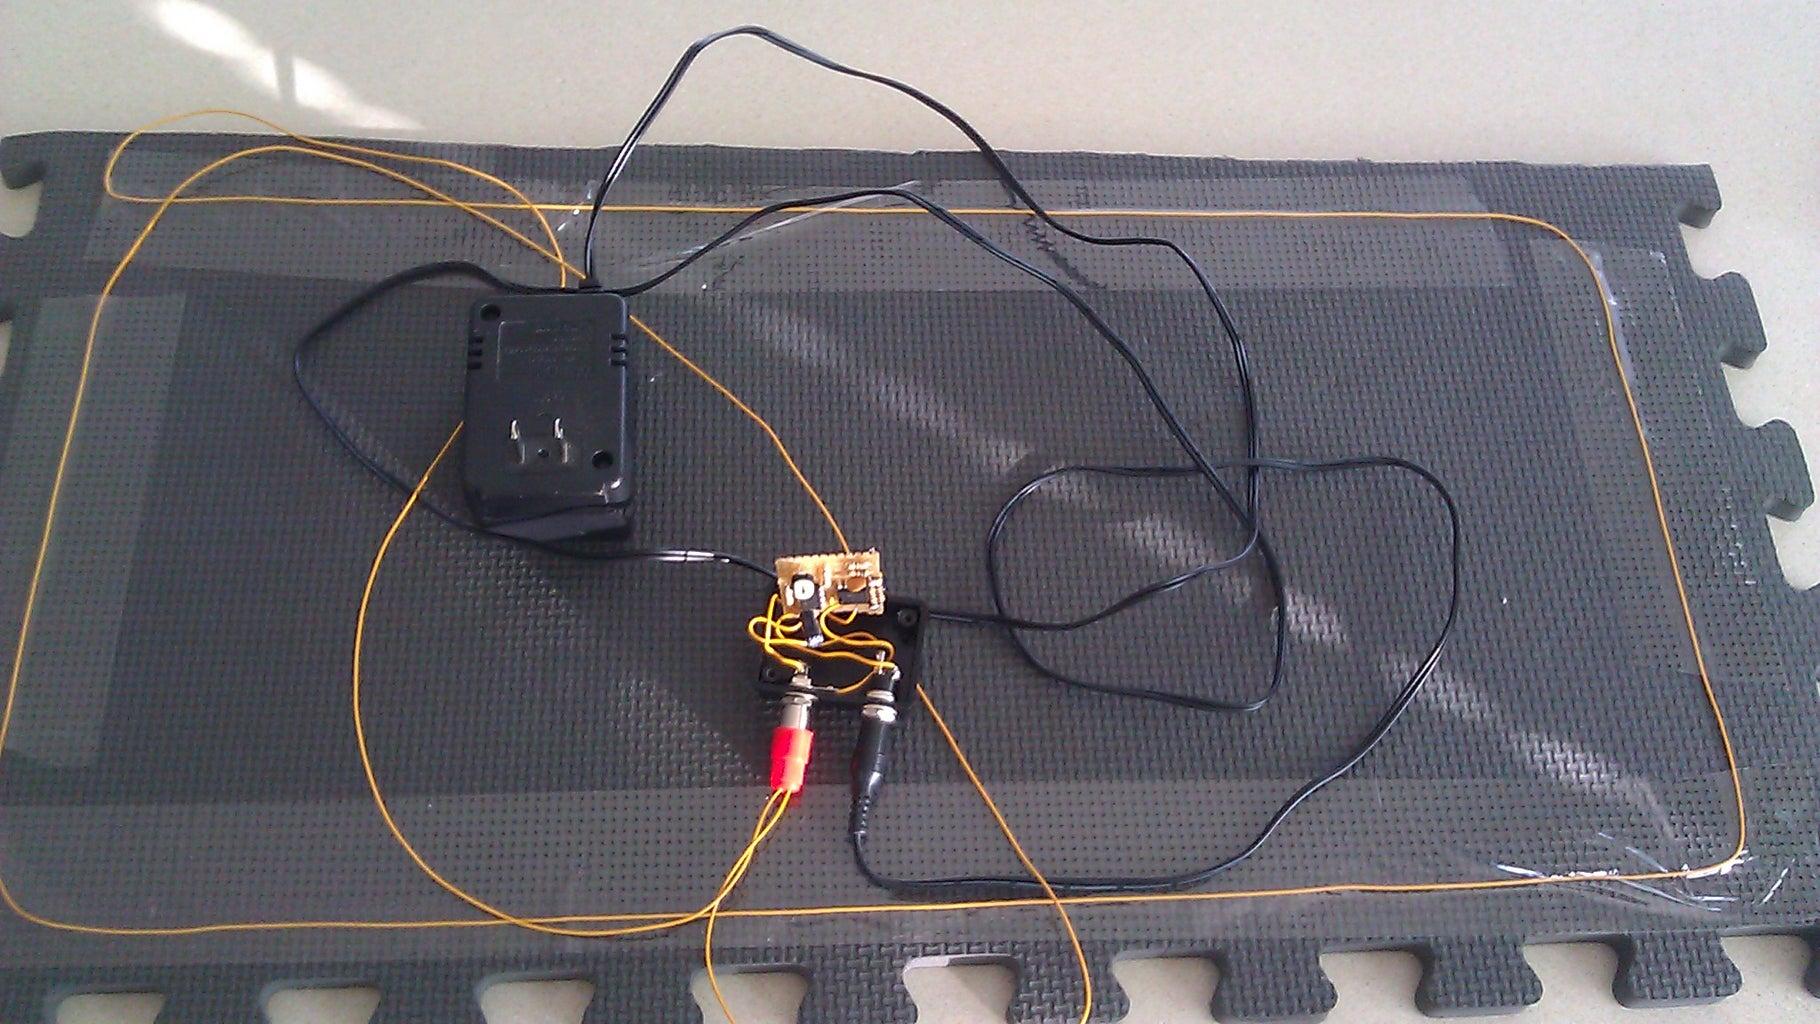 Making the Antenna